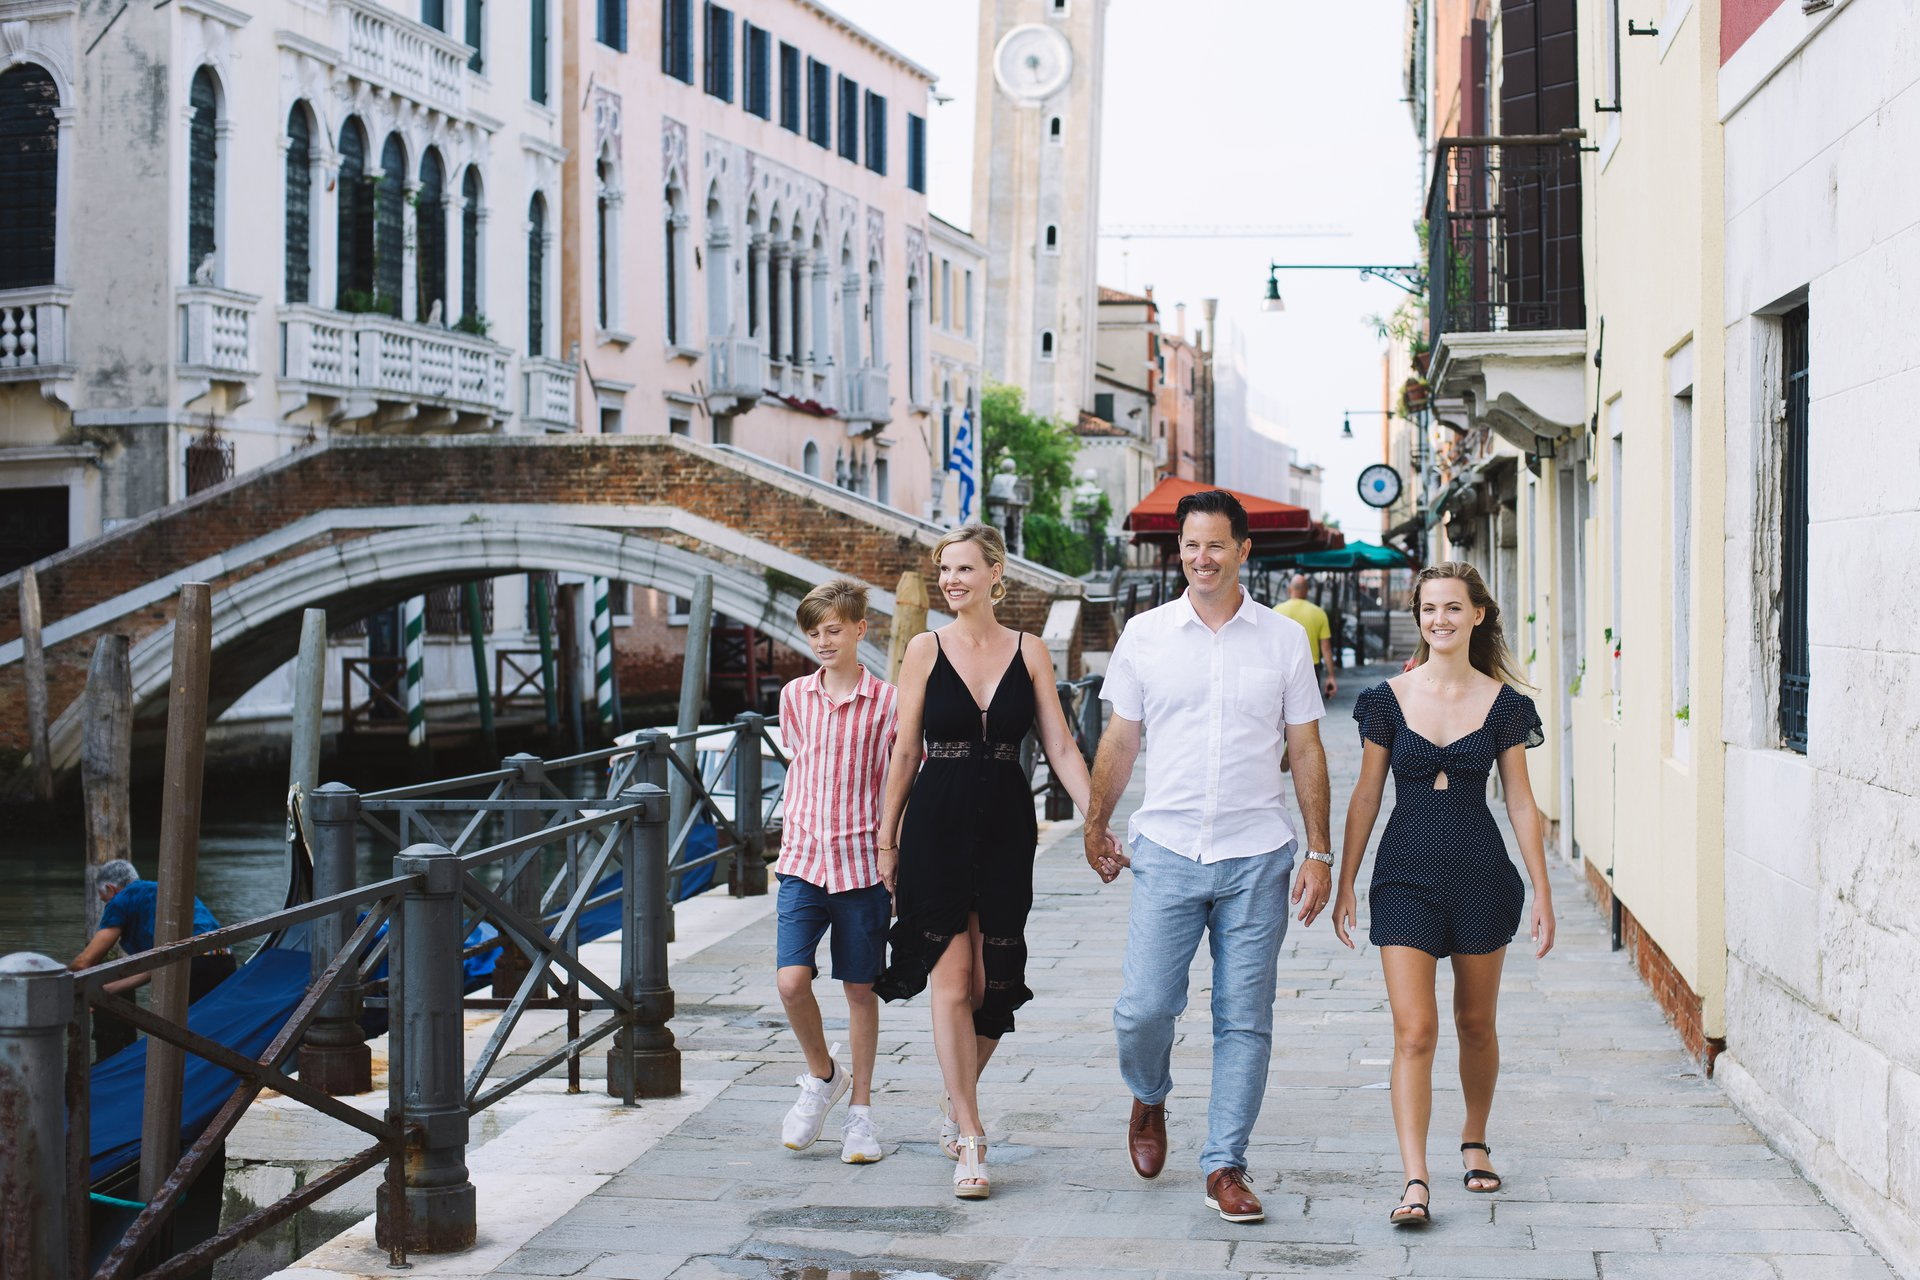 Venice-Italy-travel-story-Flytographer-5